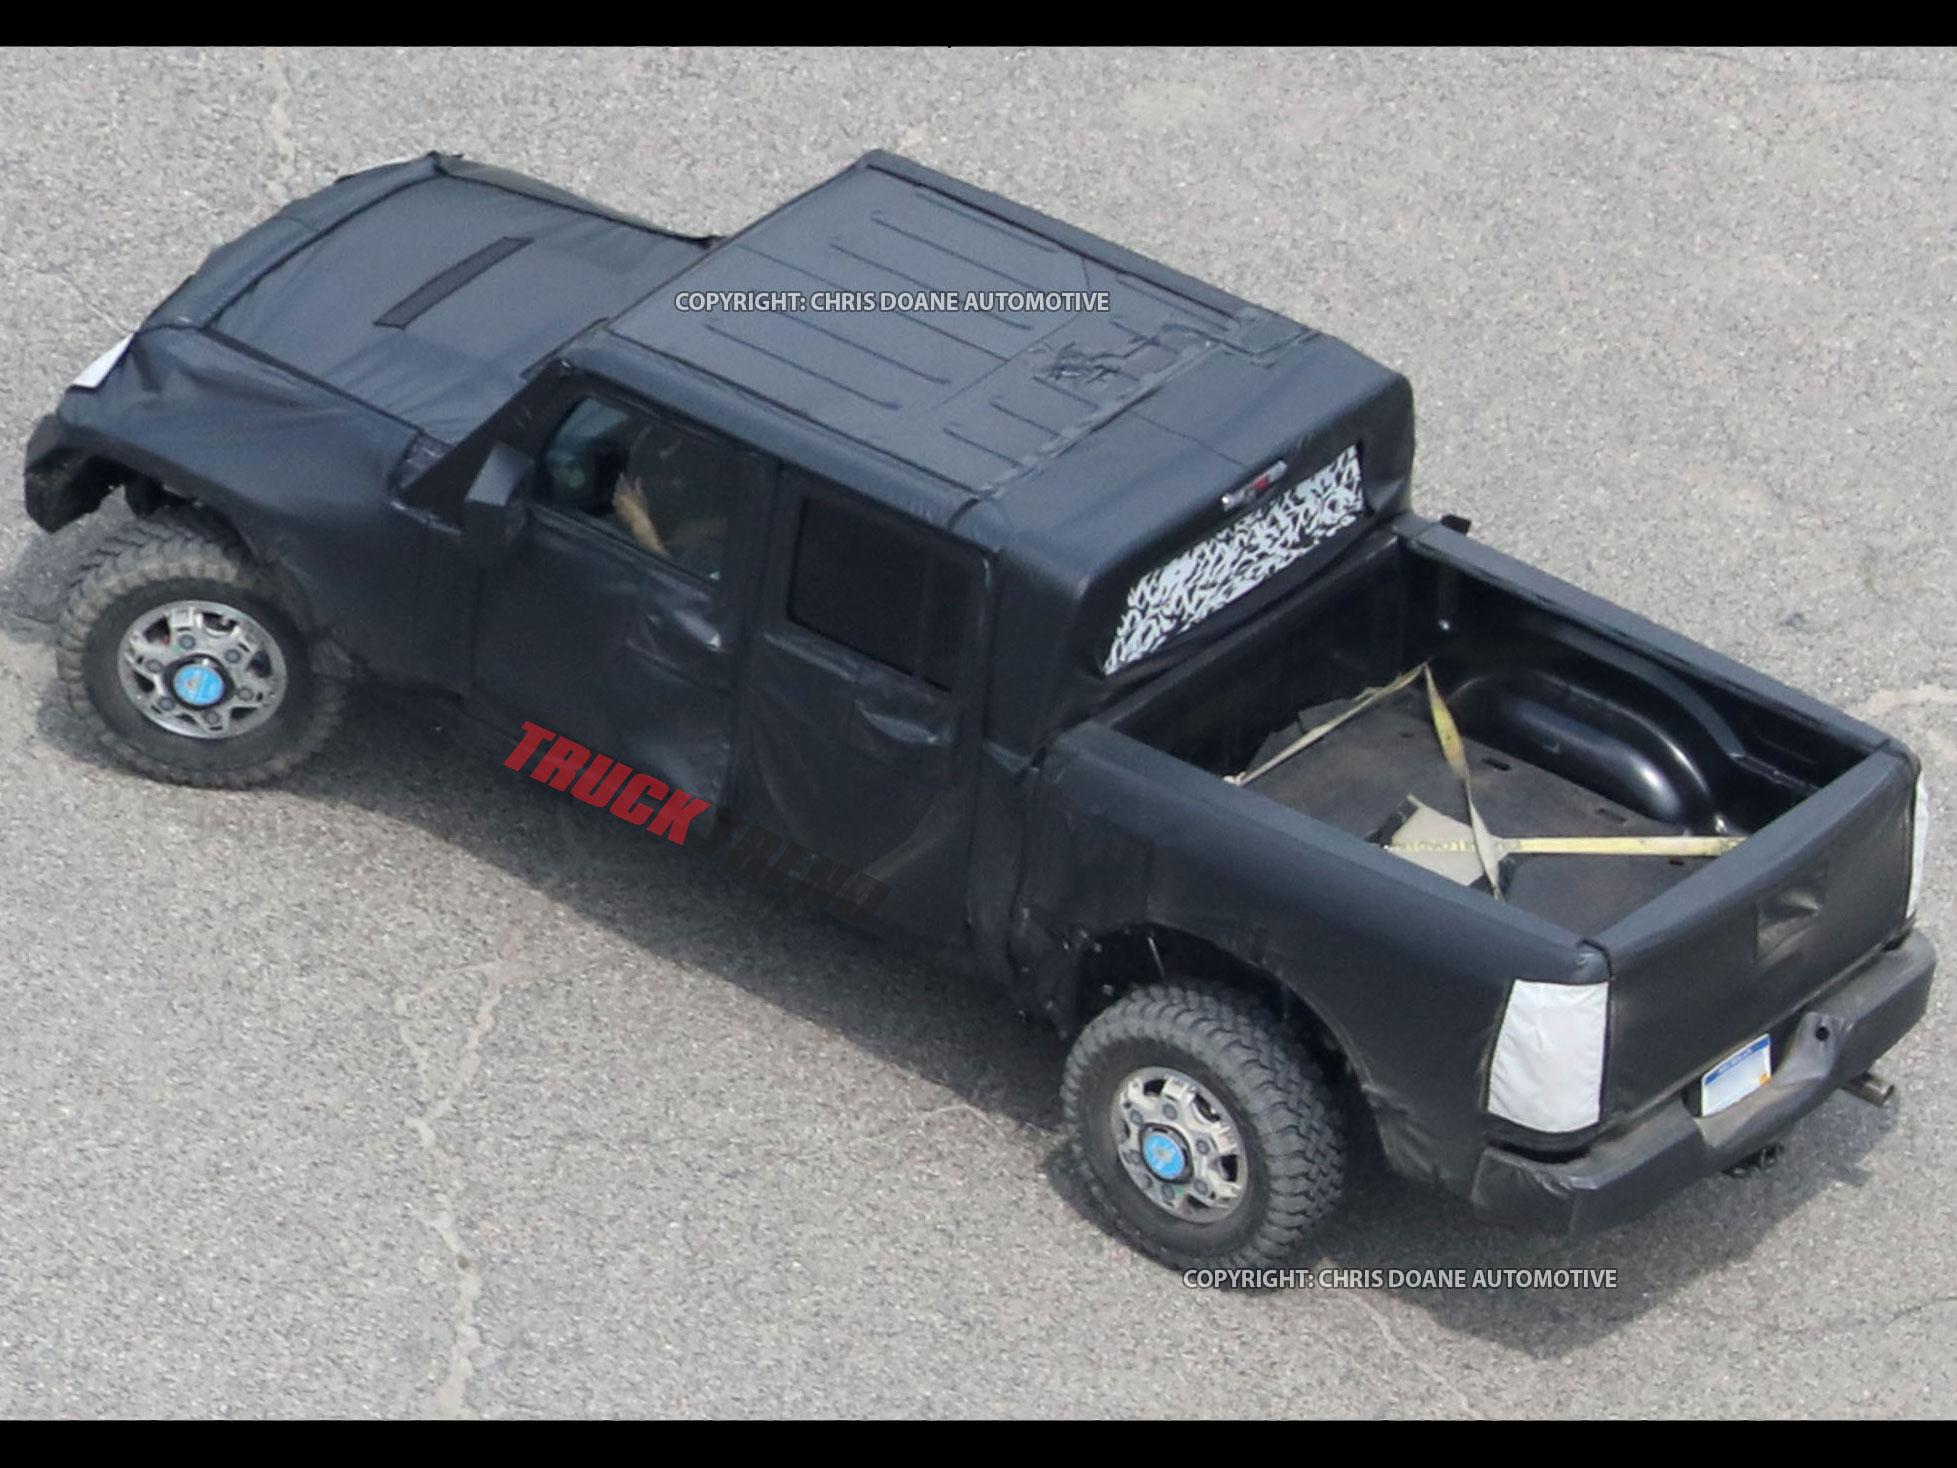 2019 Jeep Wrangler JL Pickup Spyshots 31